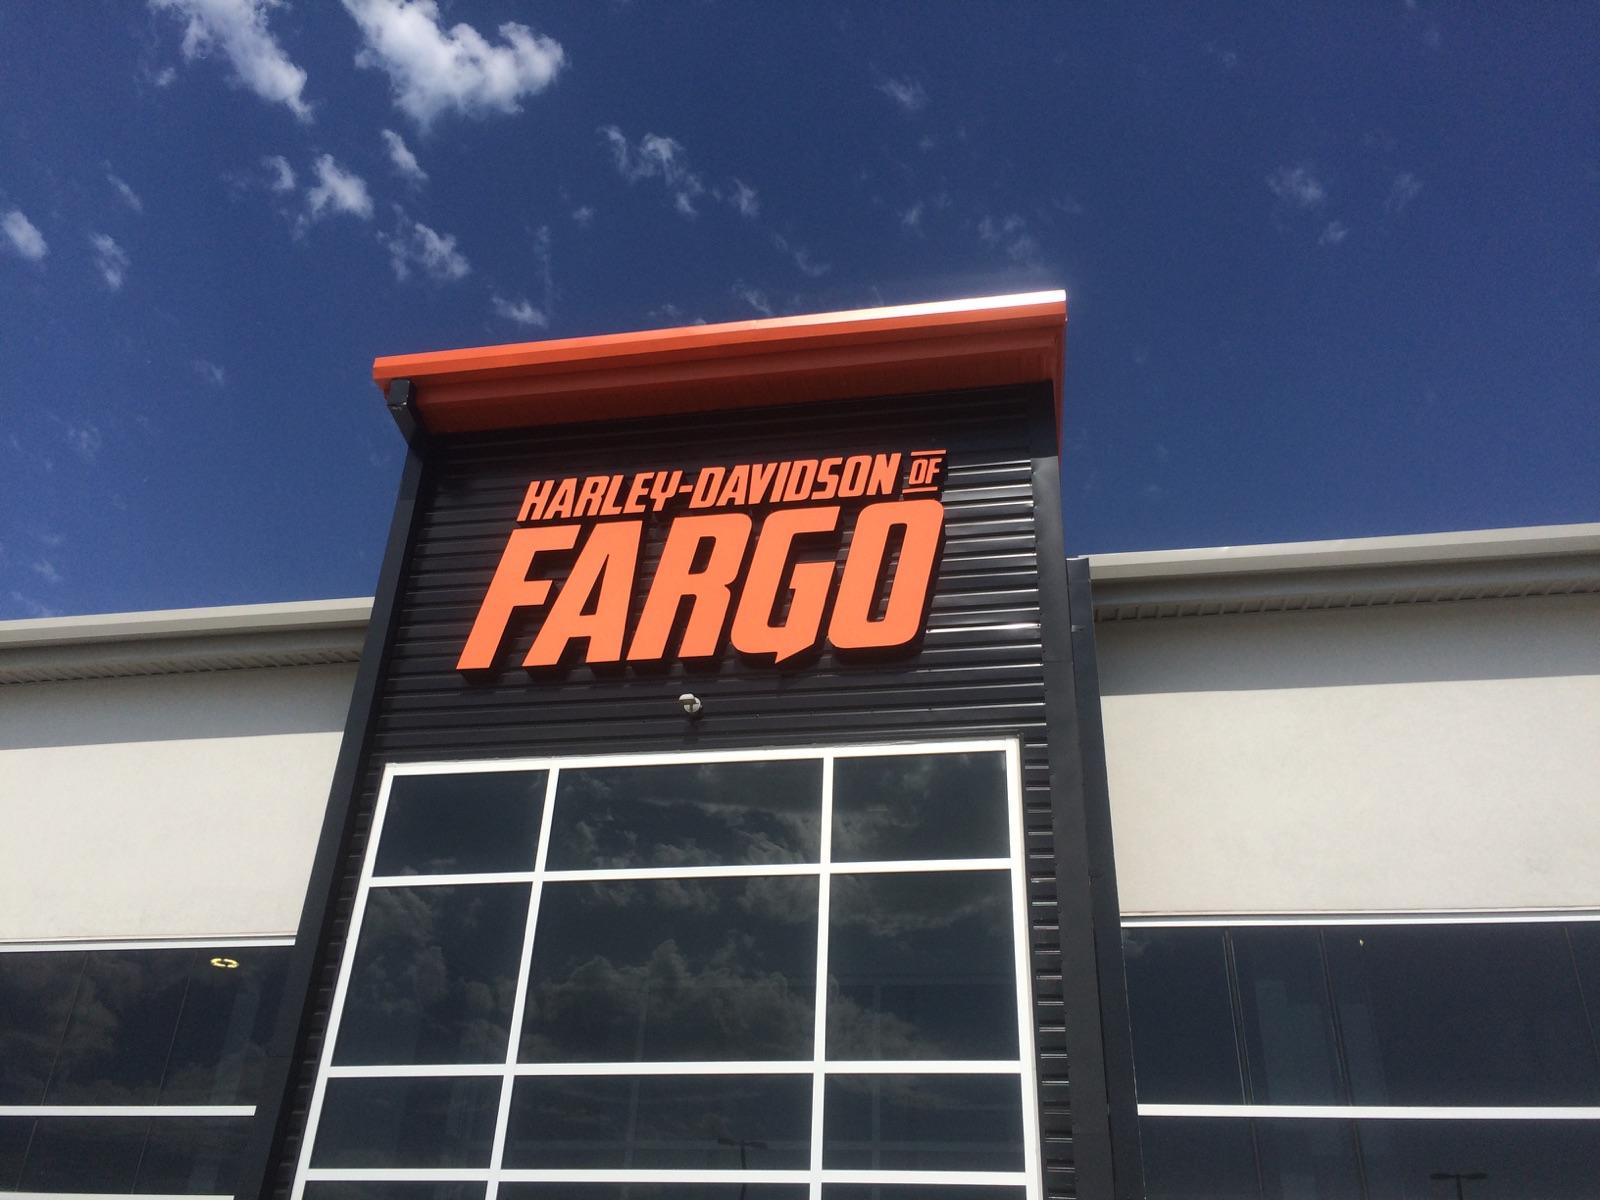 Harley Davidson of Fargo - storefront.jpg